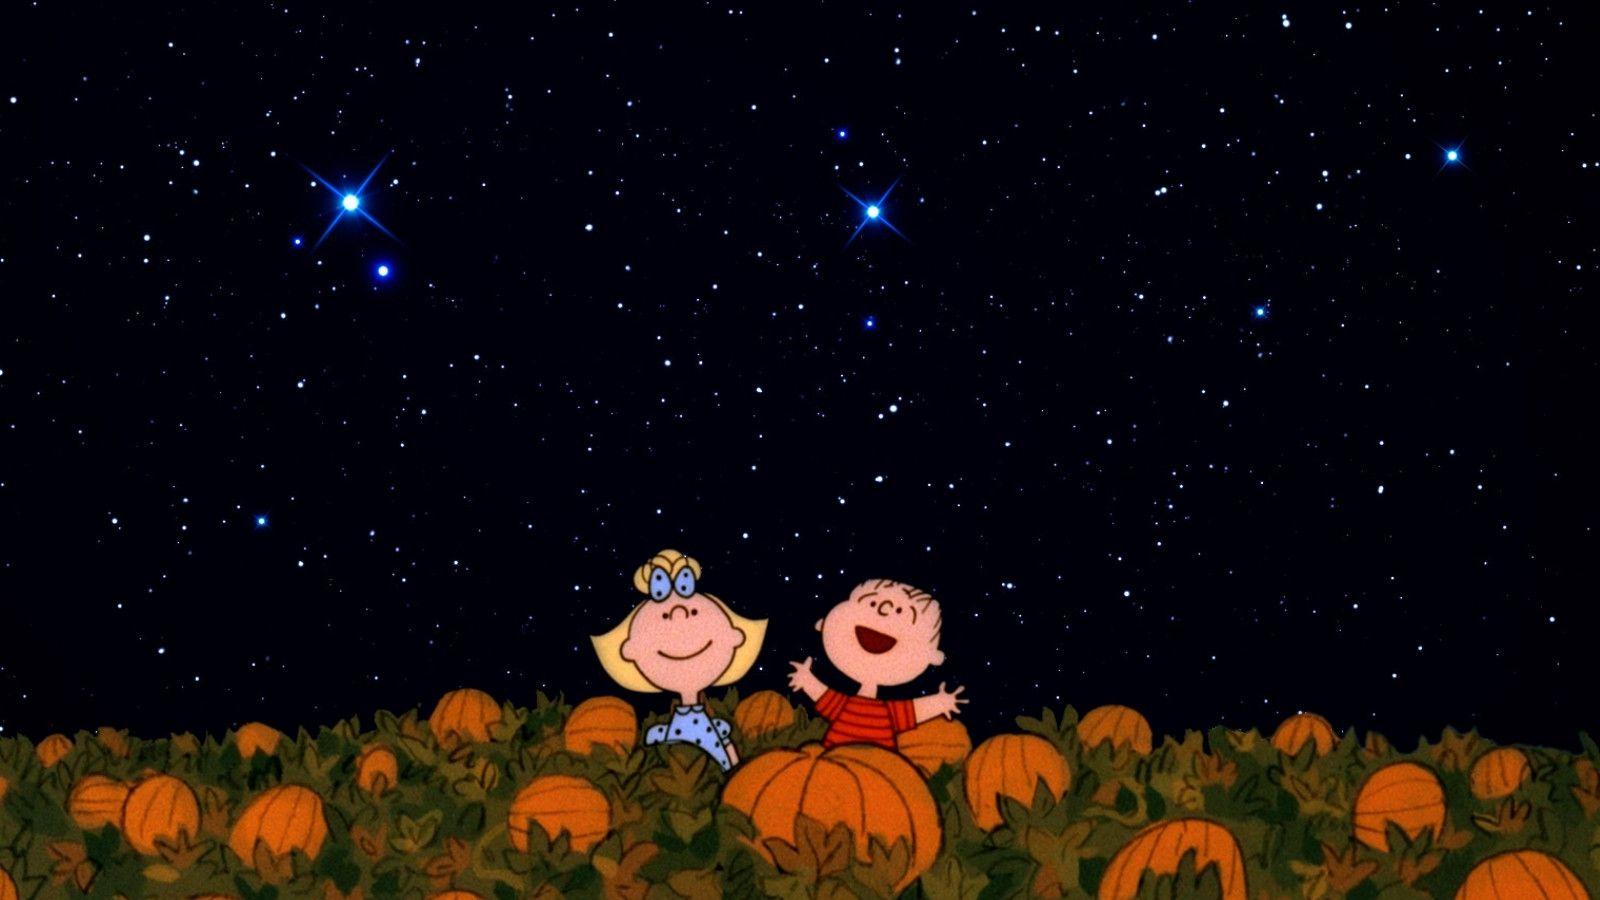 Download It's The Great Pumpkin Charlie Brown Halloween Gif